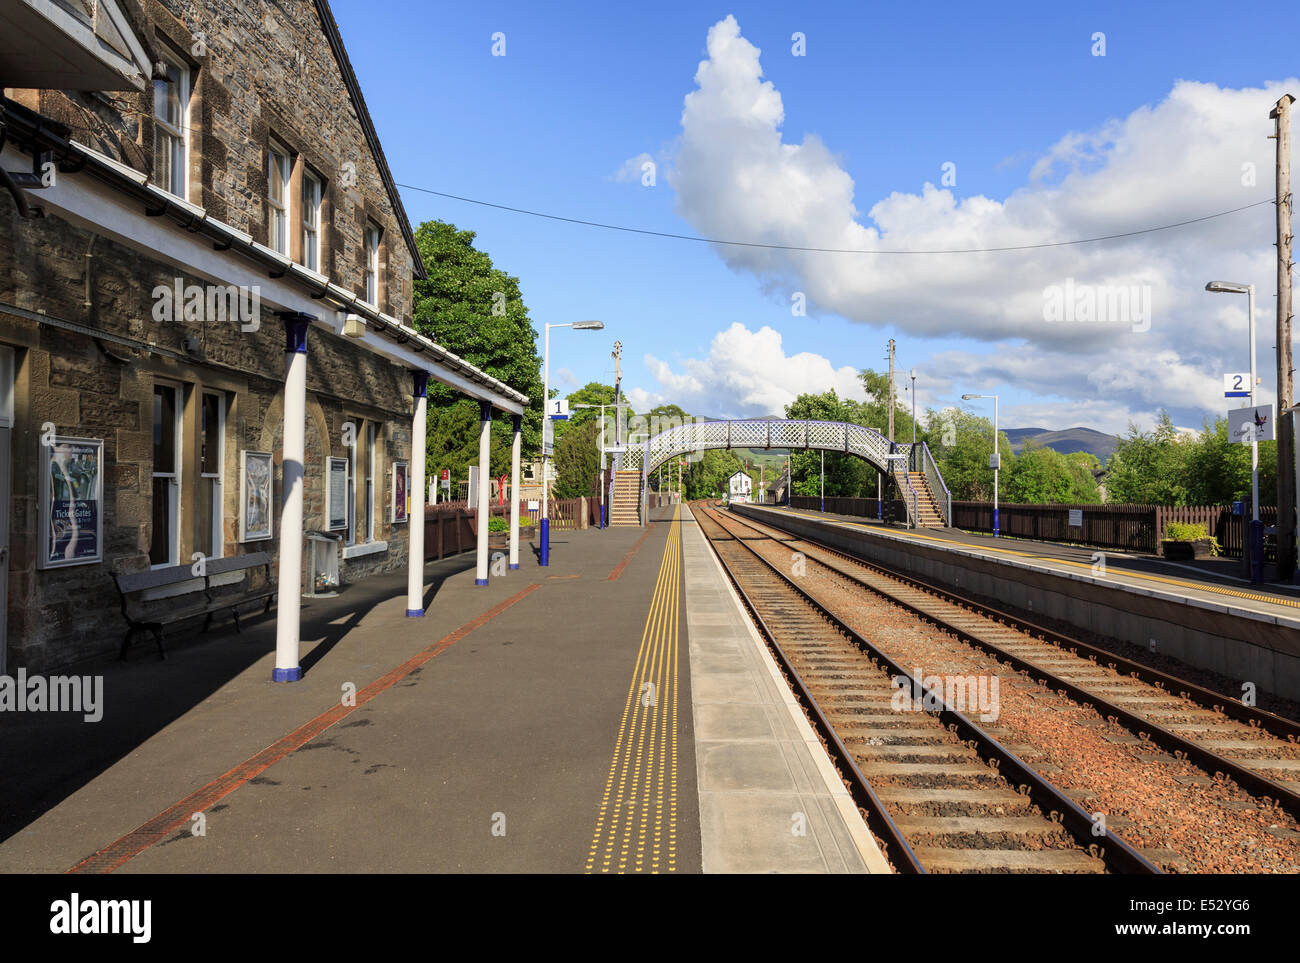 Empty railway station platform on main line between Edinburgh and Inverness. Blair Atholl, Perth and Kinross Scotland - Stock Image